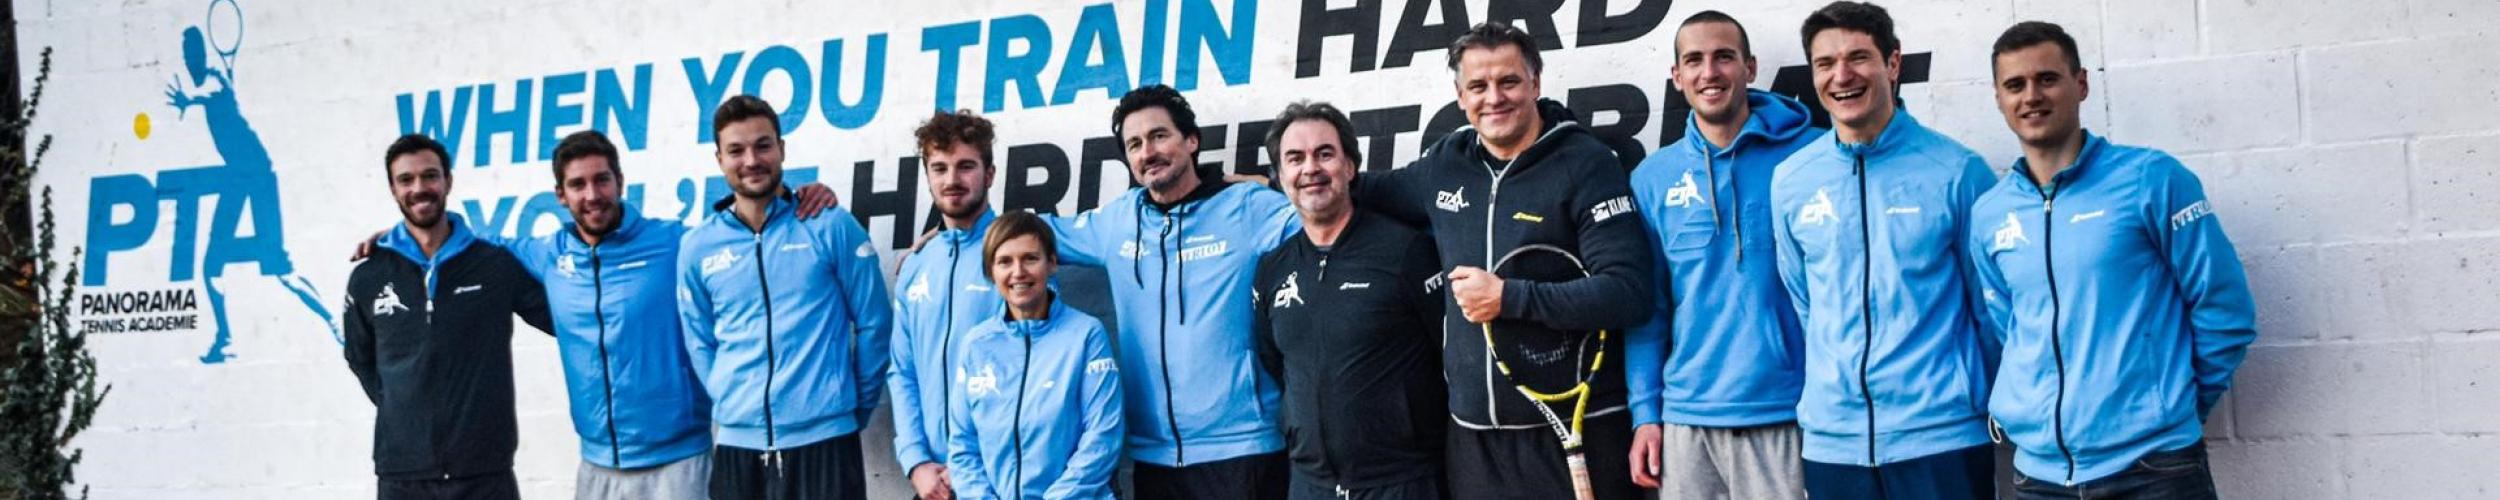 Tennis Panorama enige Brabantse club met KDT én JDT-kwaliteitslabel